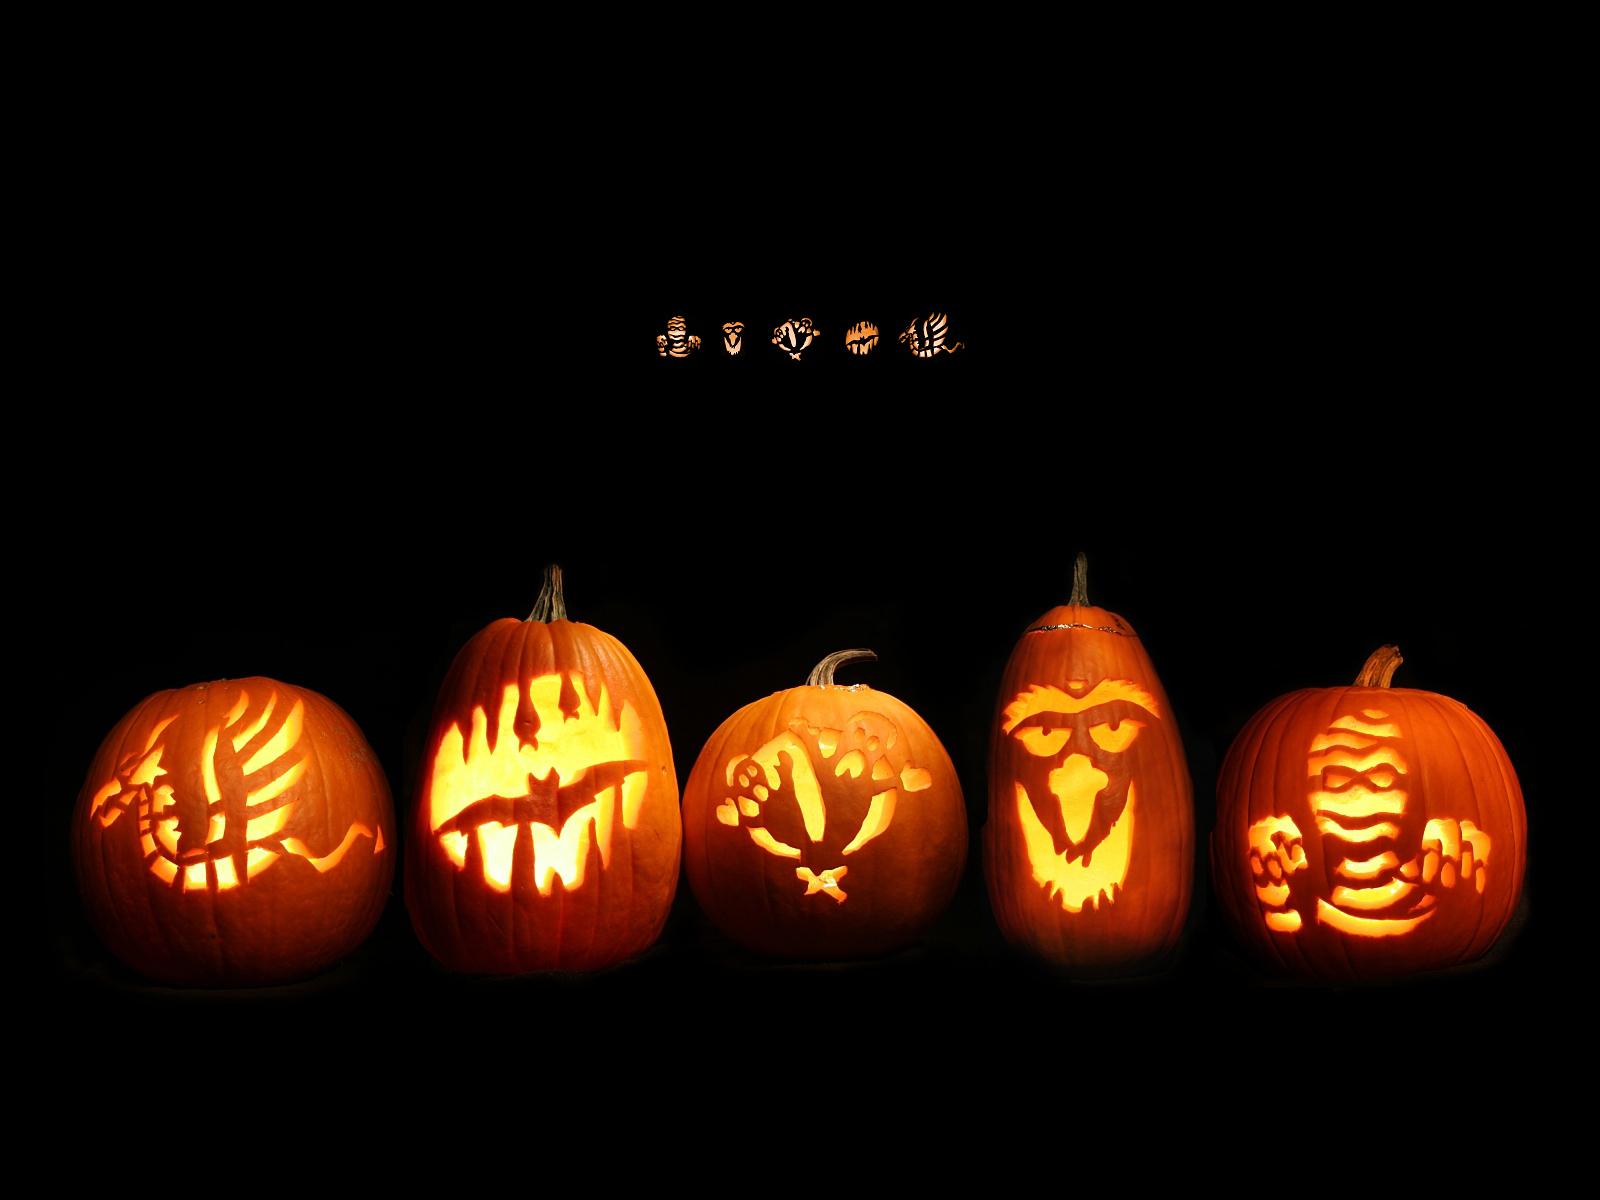 http://3.bp.blogspot.com/-B-WG3s9qHdo/UI5c_aFwL5I/AAAAAAAACEg/aZi8I3oUx80/s1600/joyeuse+fete+halloween.jpg